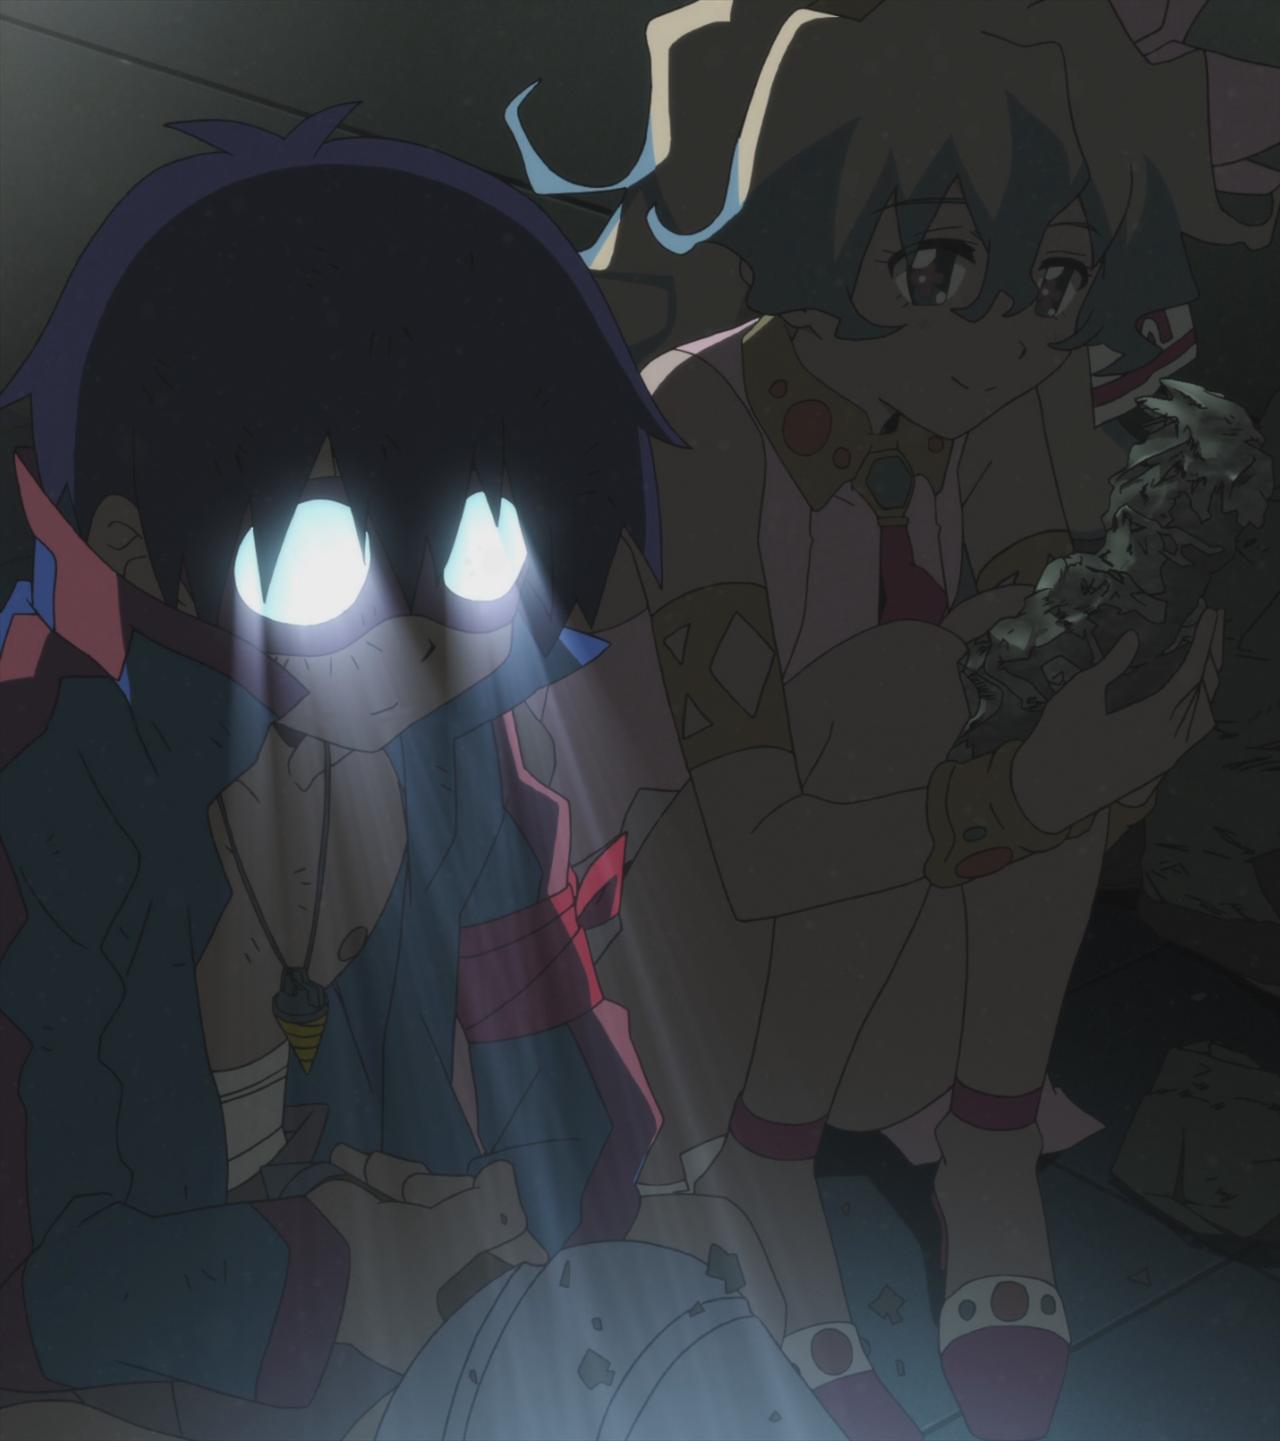 Simon S Obligatory Anime Glasses And Nia Anime Gurren Lagann Photo